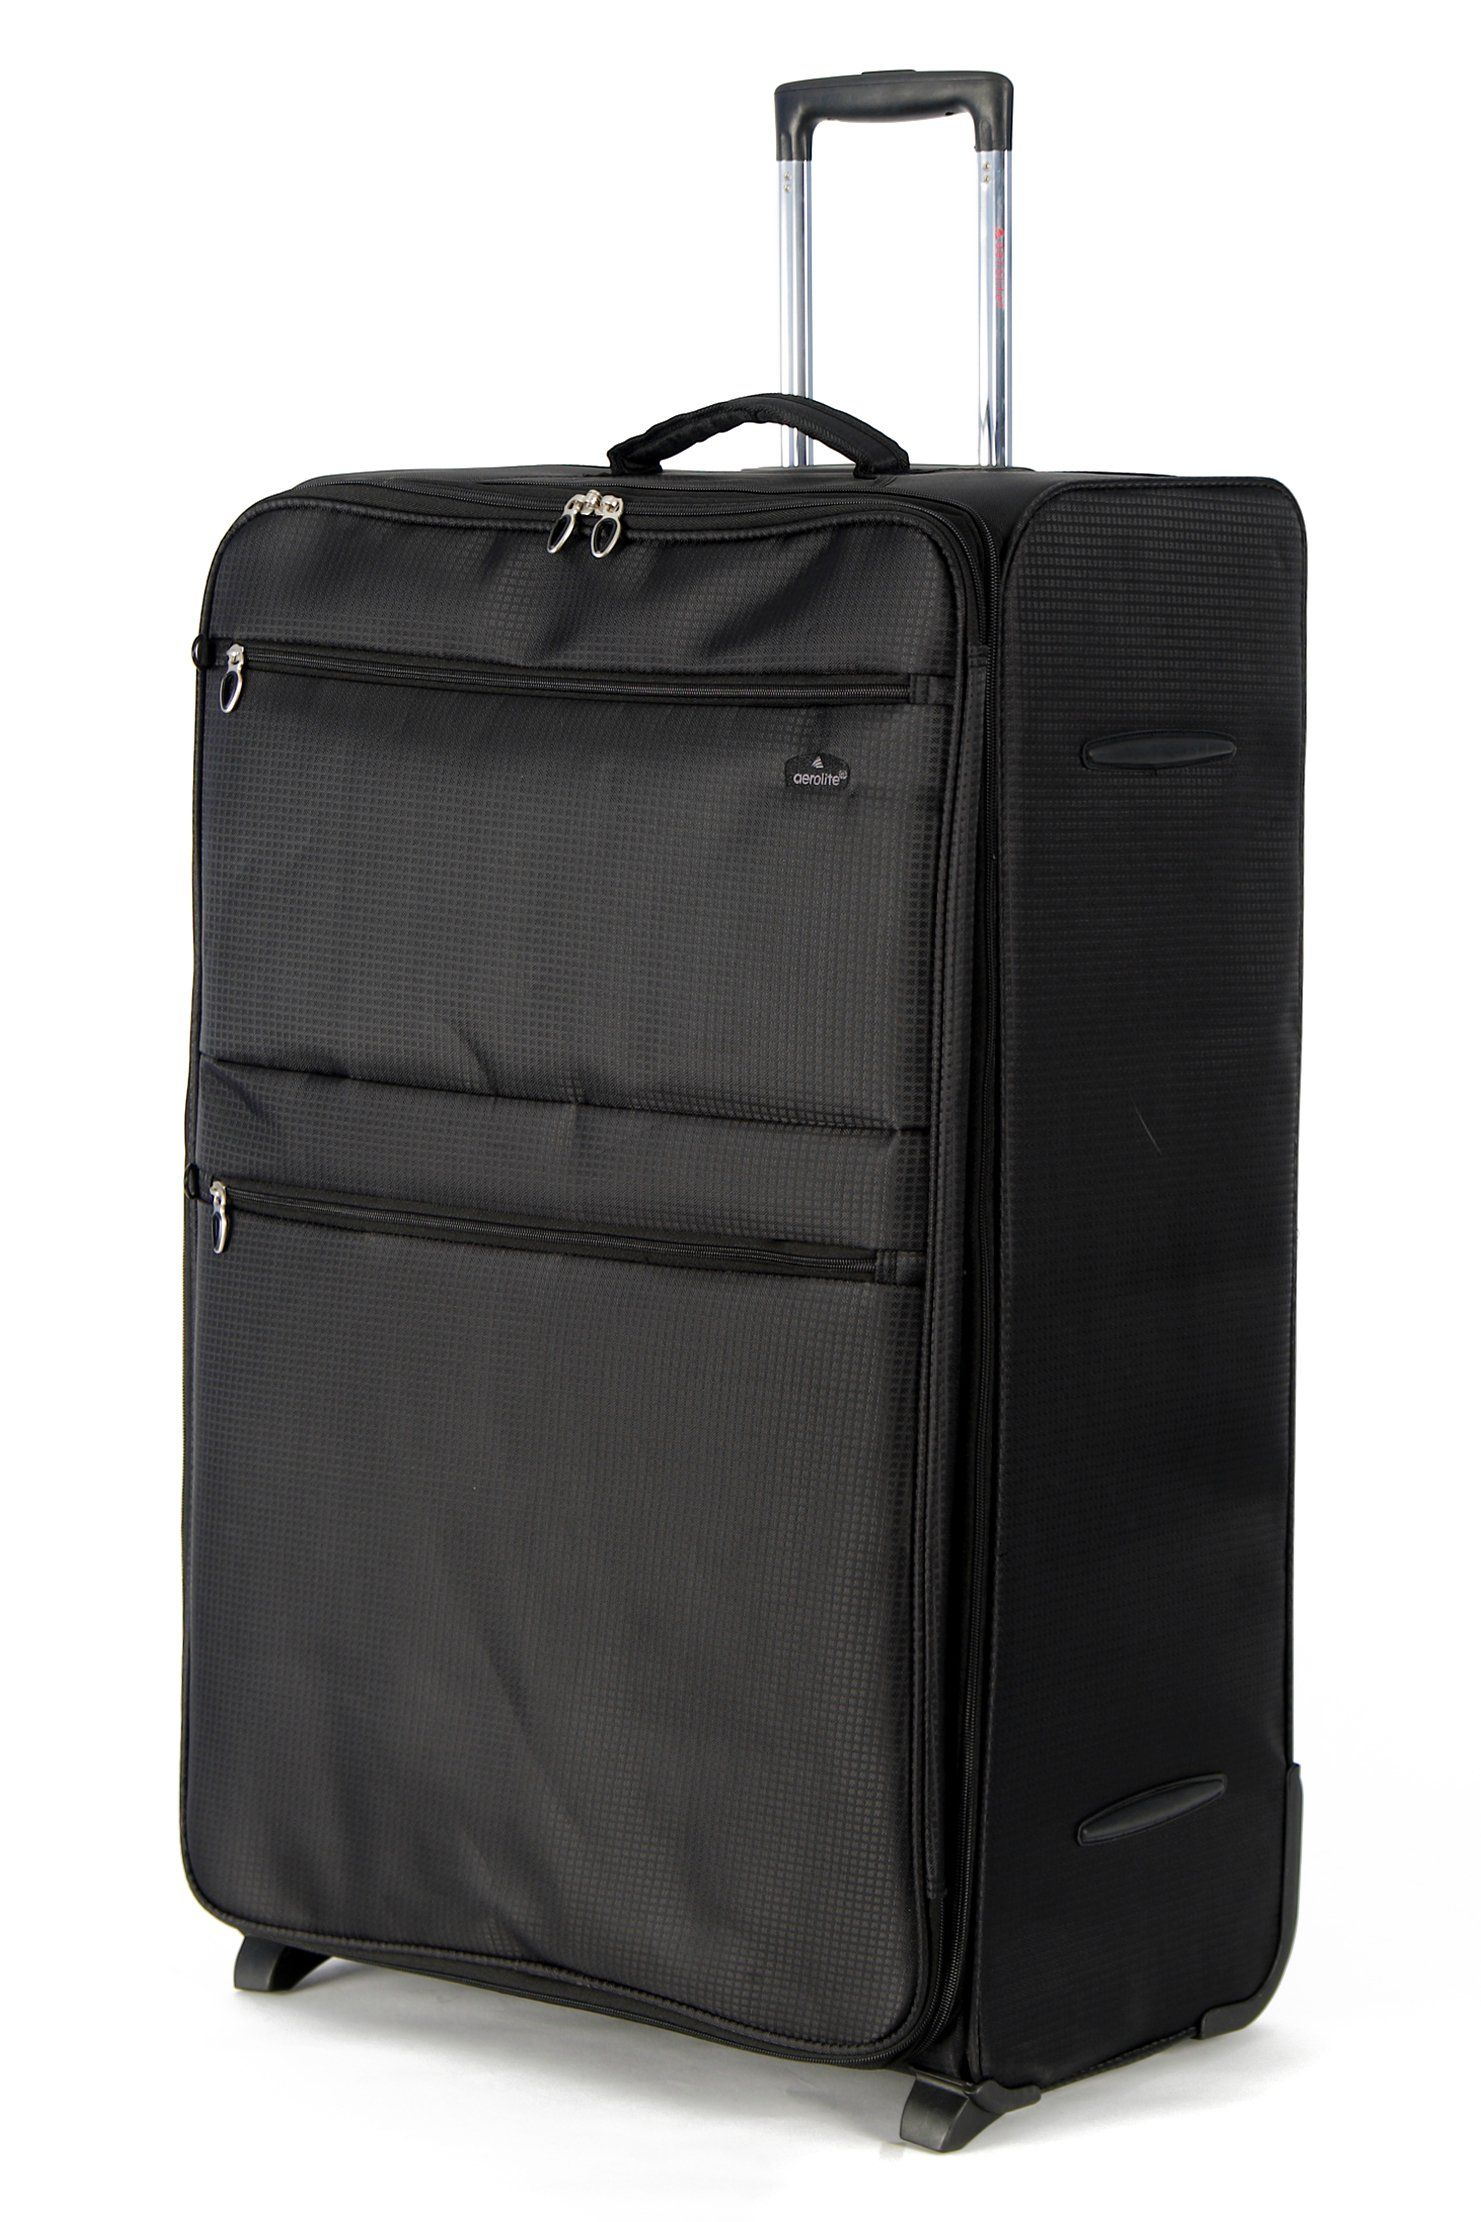 Aerolite Super-Lightweight Suitcase Luggage, World Lightest ...